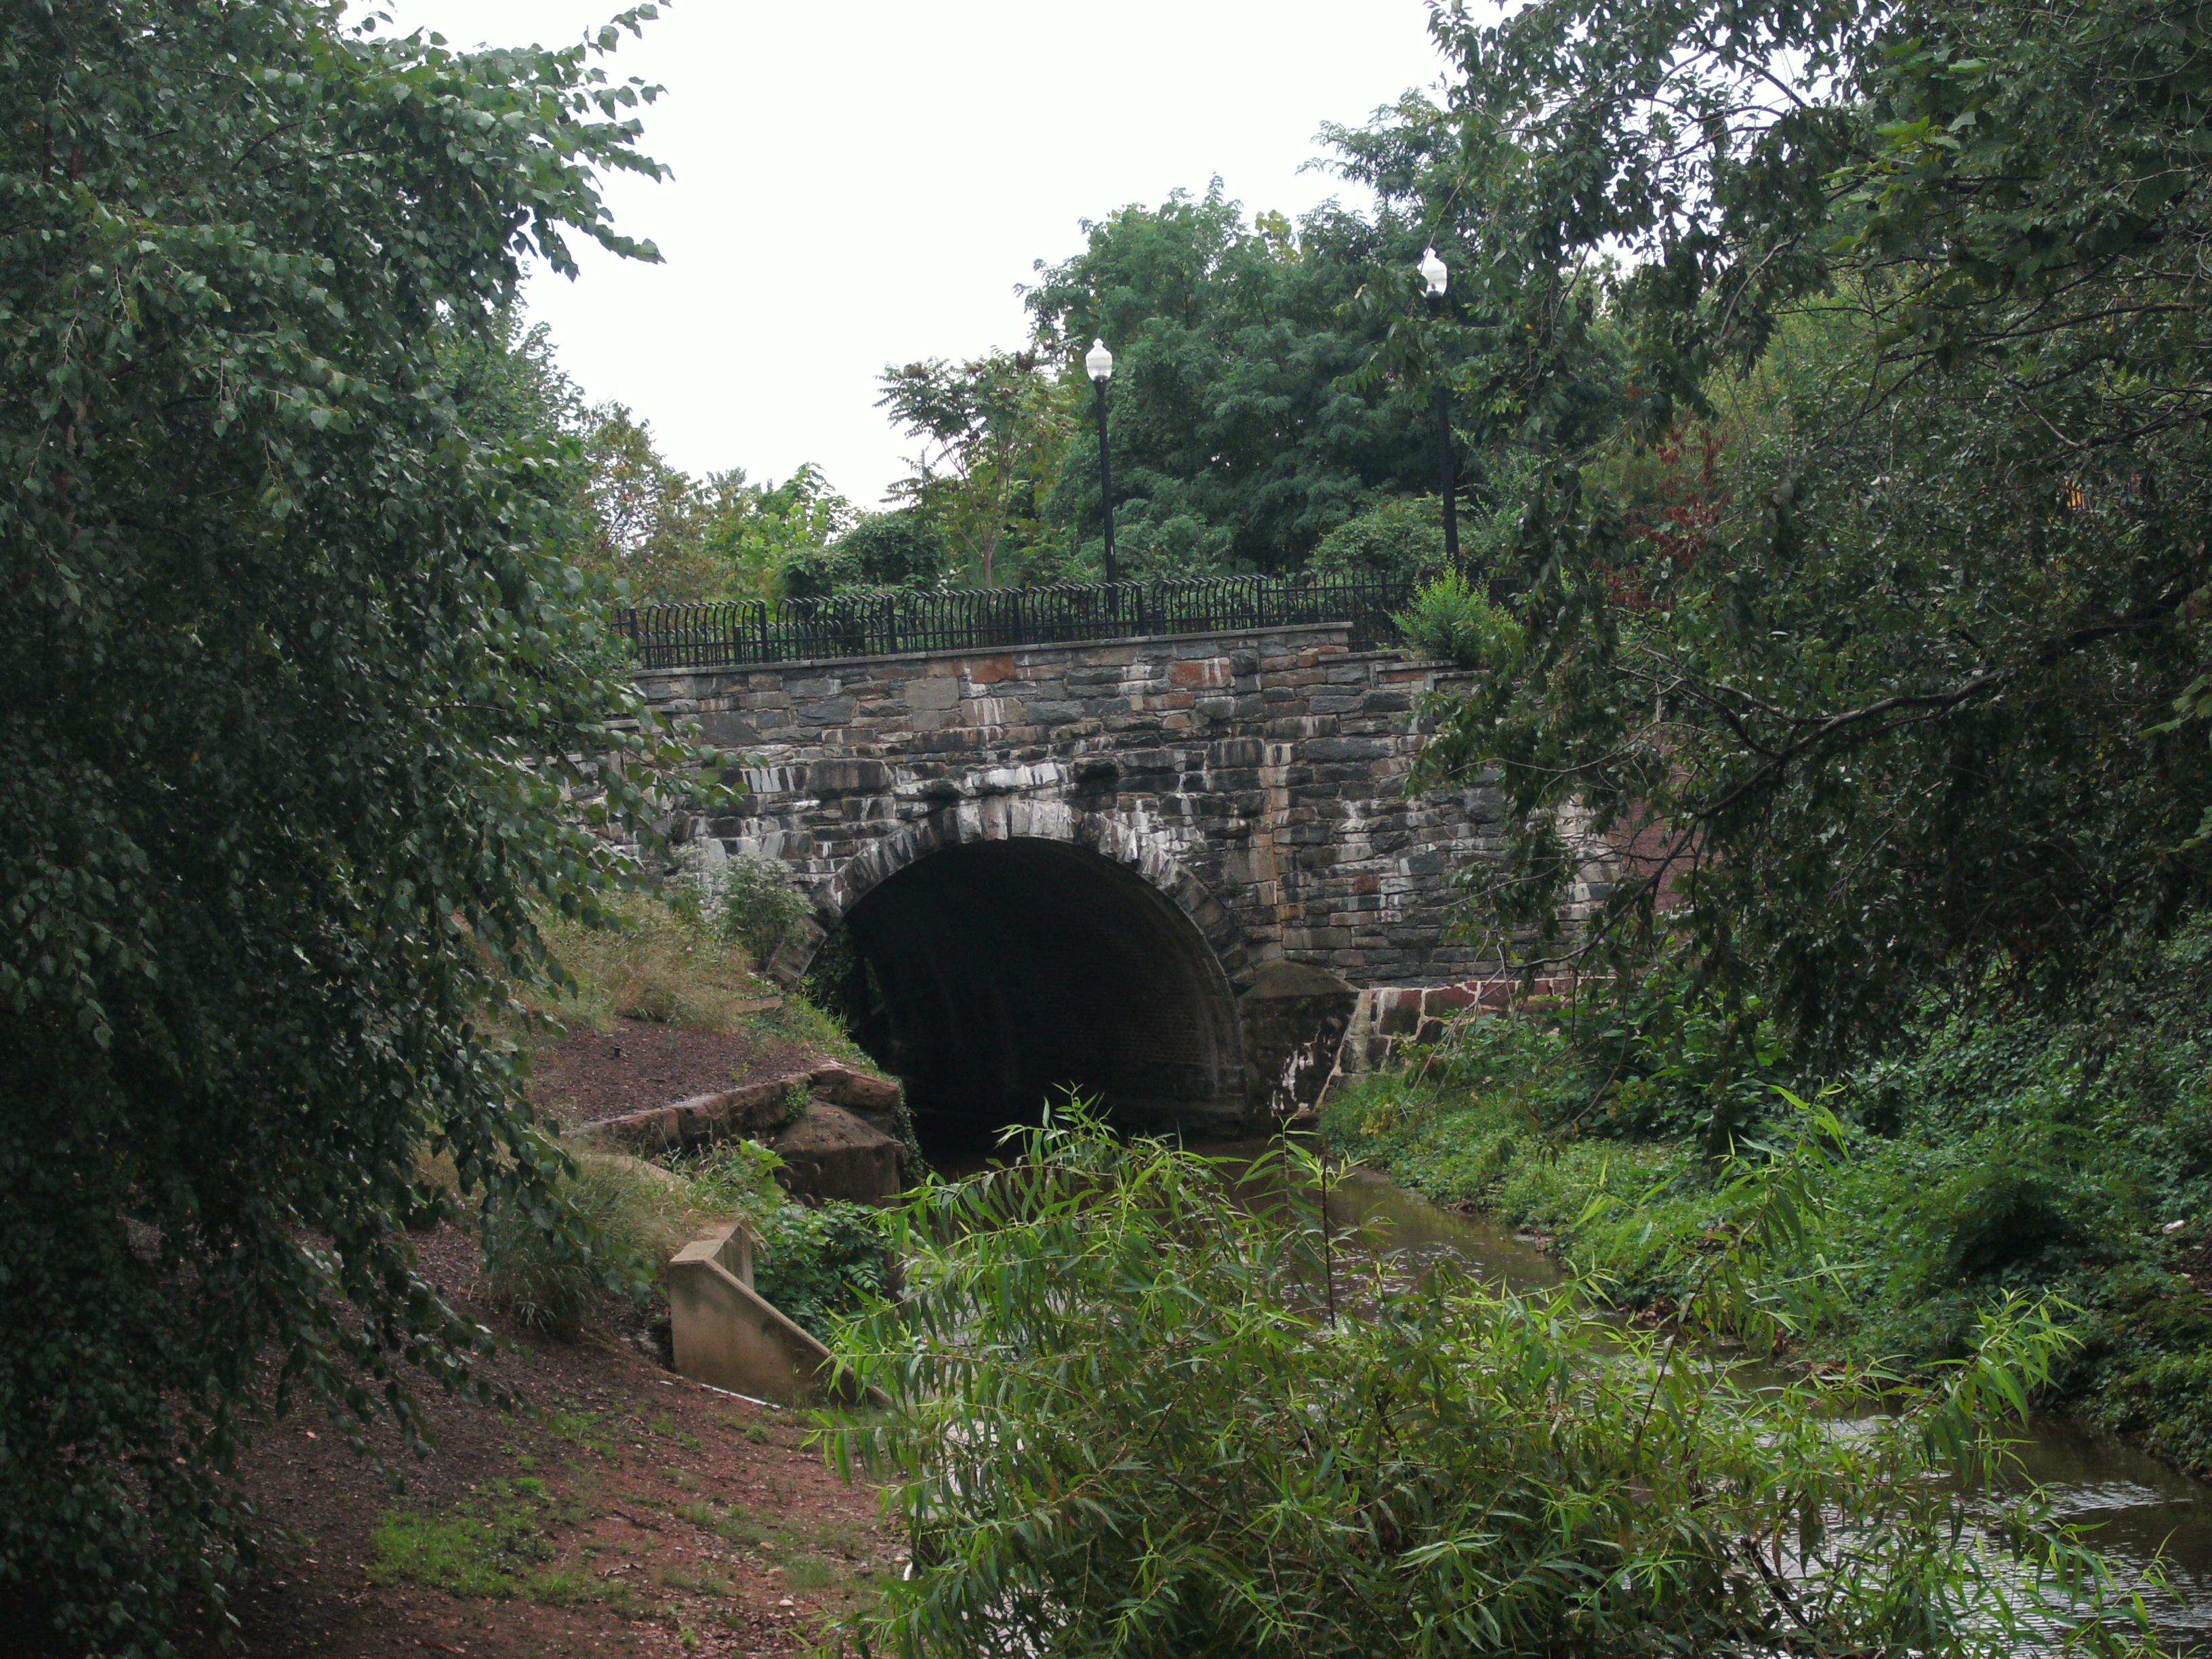 Orange and Alexandria Railroad Hooff's Run Bridge. Source: https://commons.wikimedia.org/w/index.php?curid=12350646